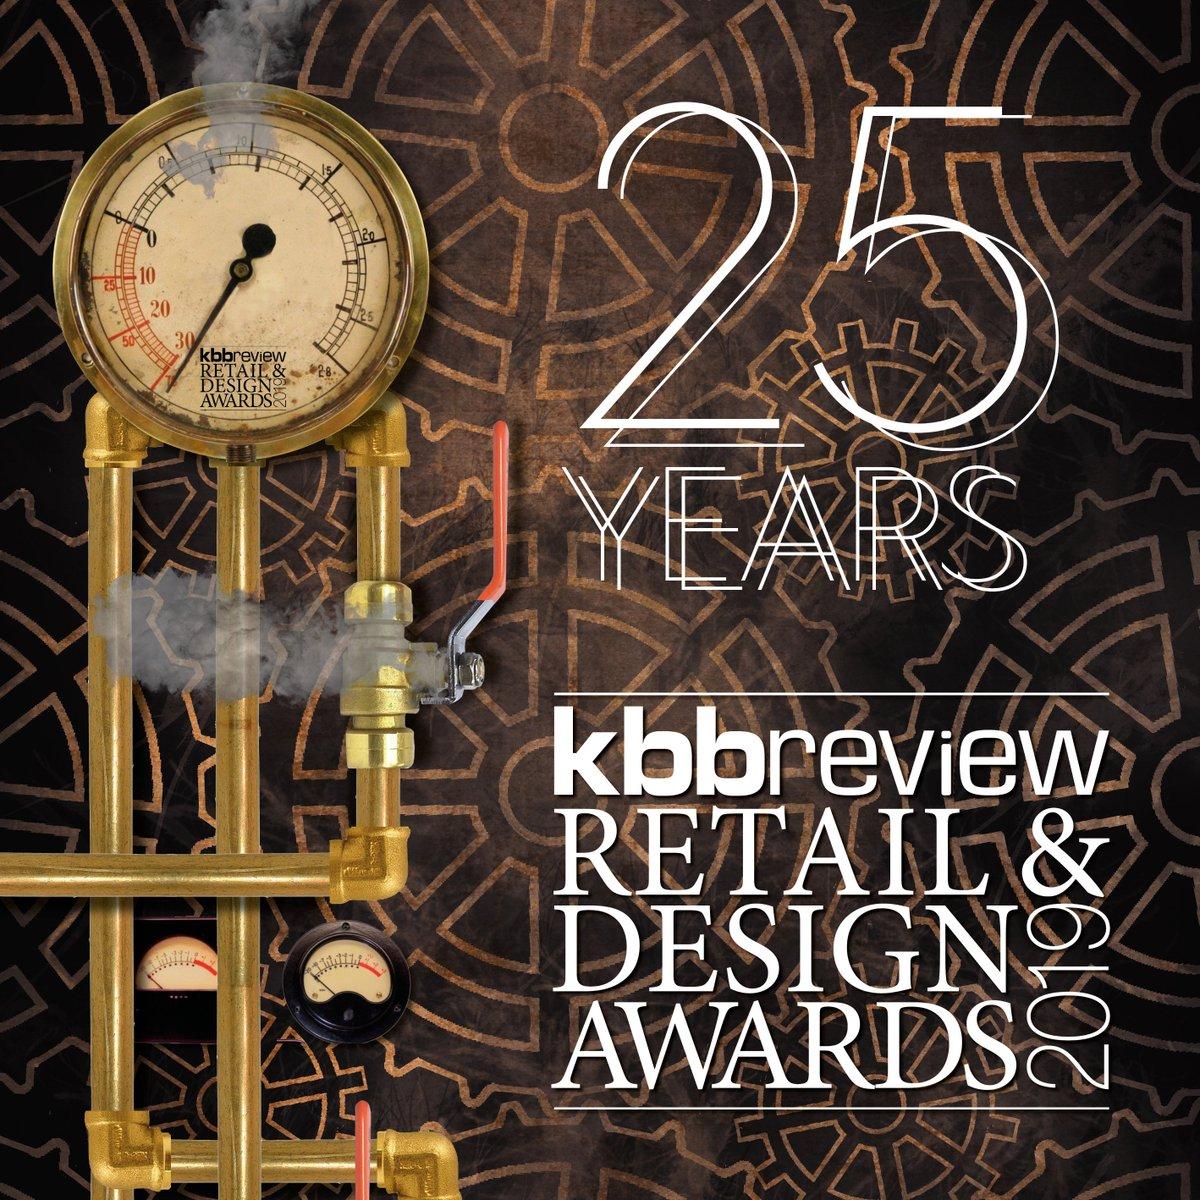 Secure your place at the industry's biggest awards #kbbawards19 #kbbawards ow.ly/2lbe50jU8ho